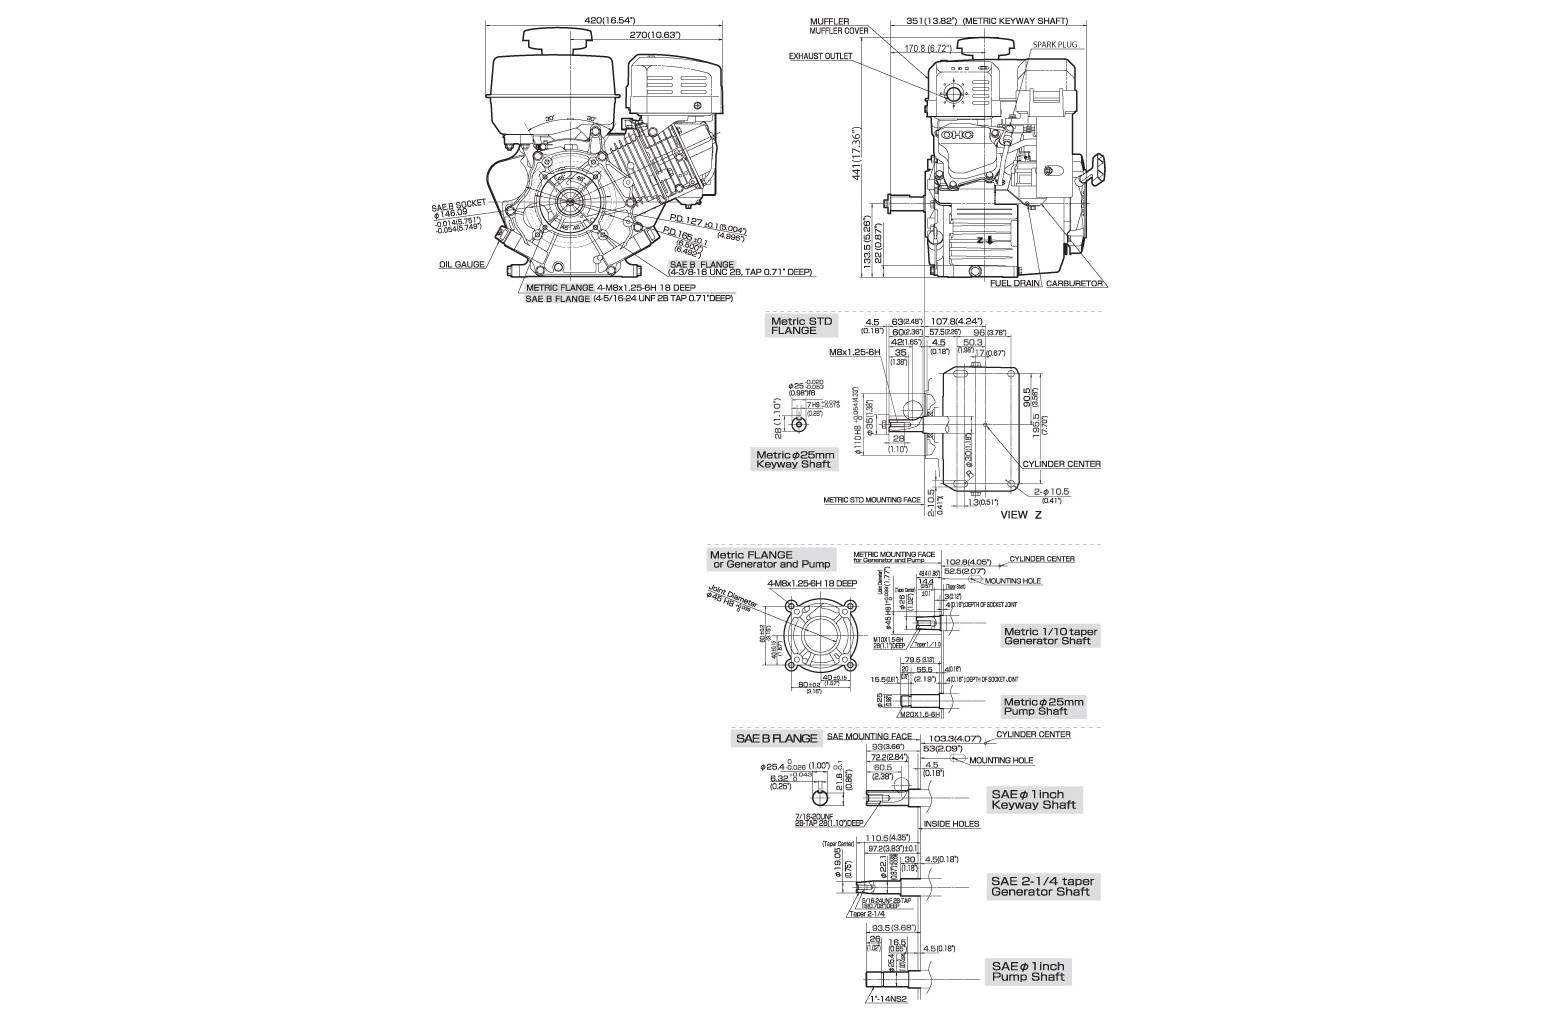 hight resolution of  item 2017 robin subaru ex27 locationid 27483 itemurl http www smithoutdoorpowerequipment com new models 2017 robin subaru ex27 25334743b